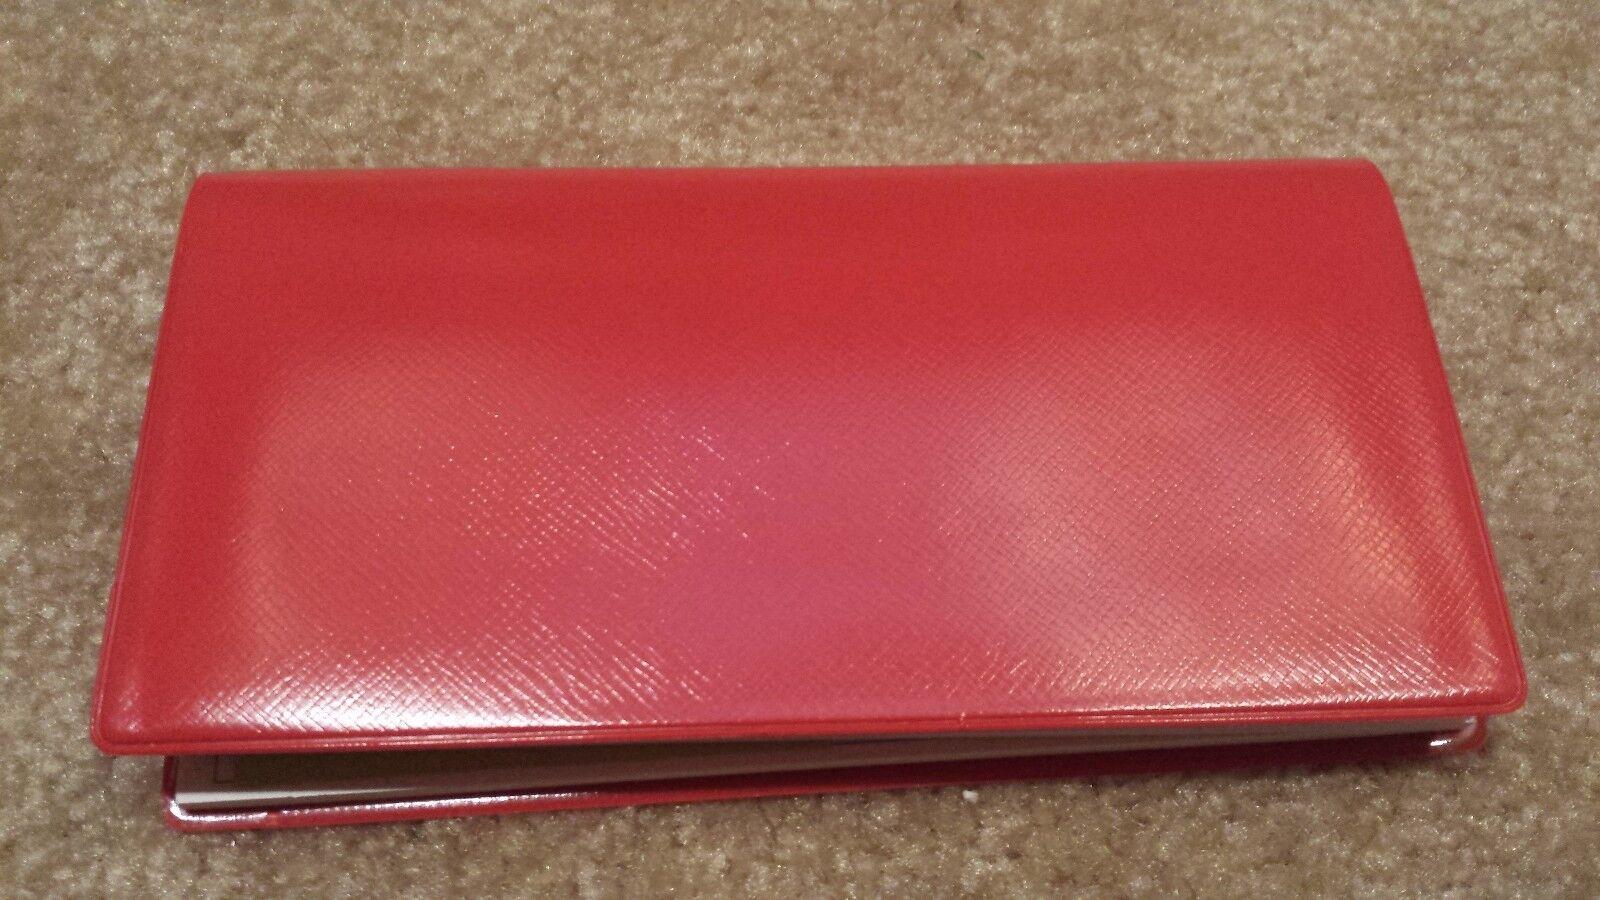 1 - Red Vinyl Checkbook Holder w/ Duplicate Flap Cover Top Tear Checks Register